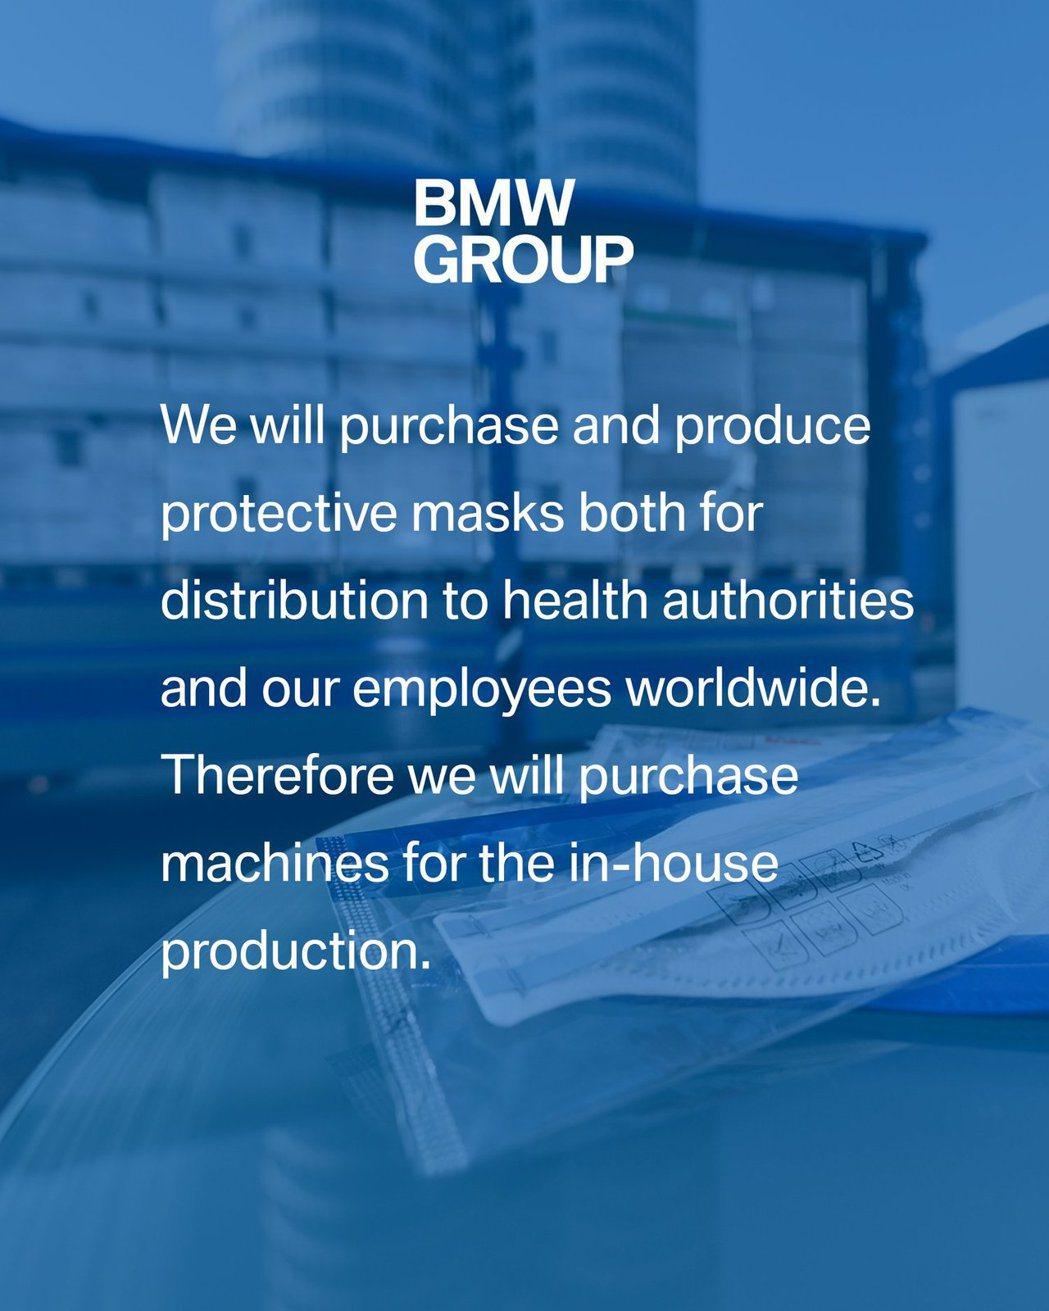 摘自BMW Facebook